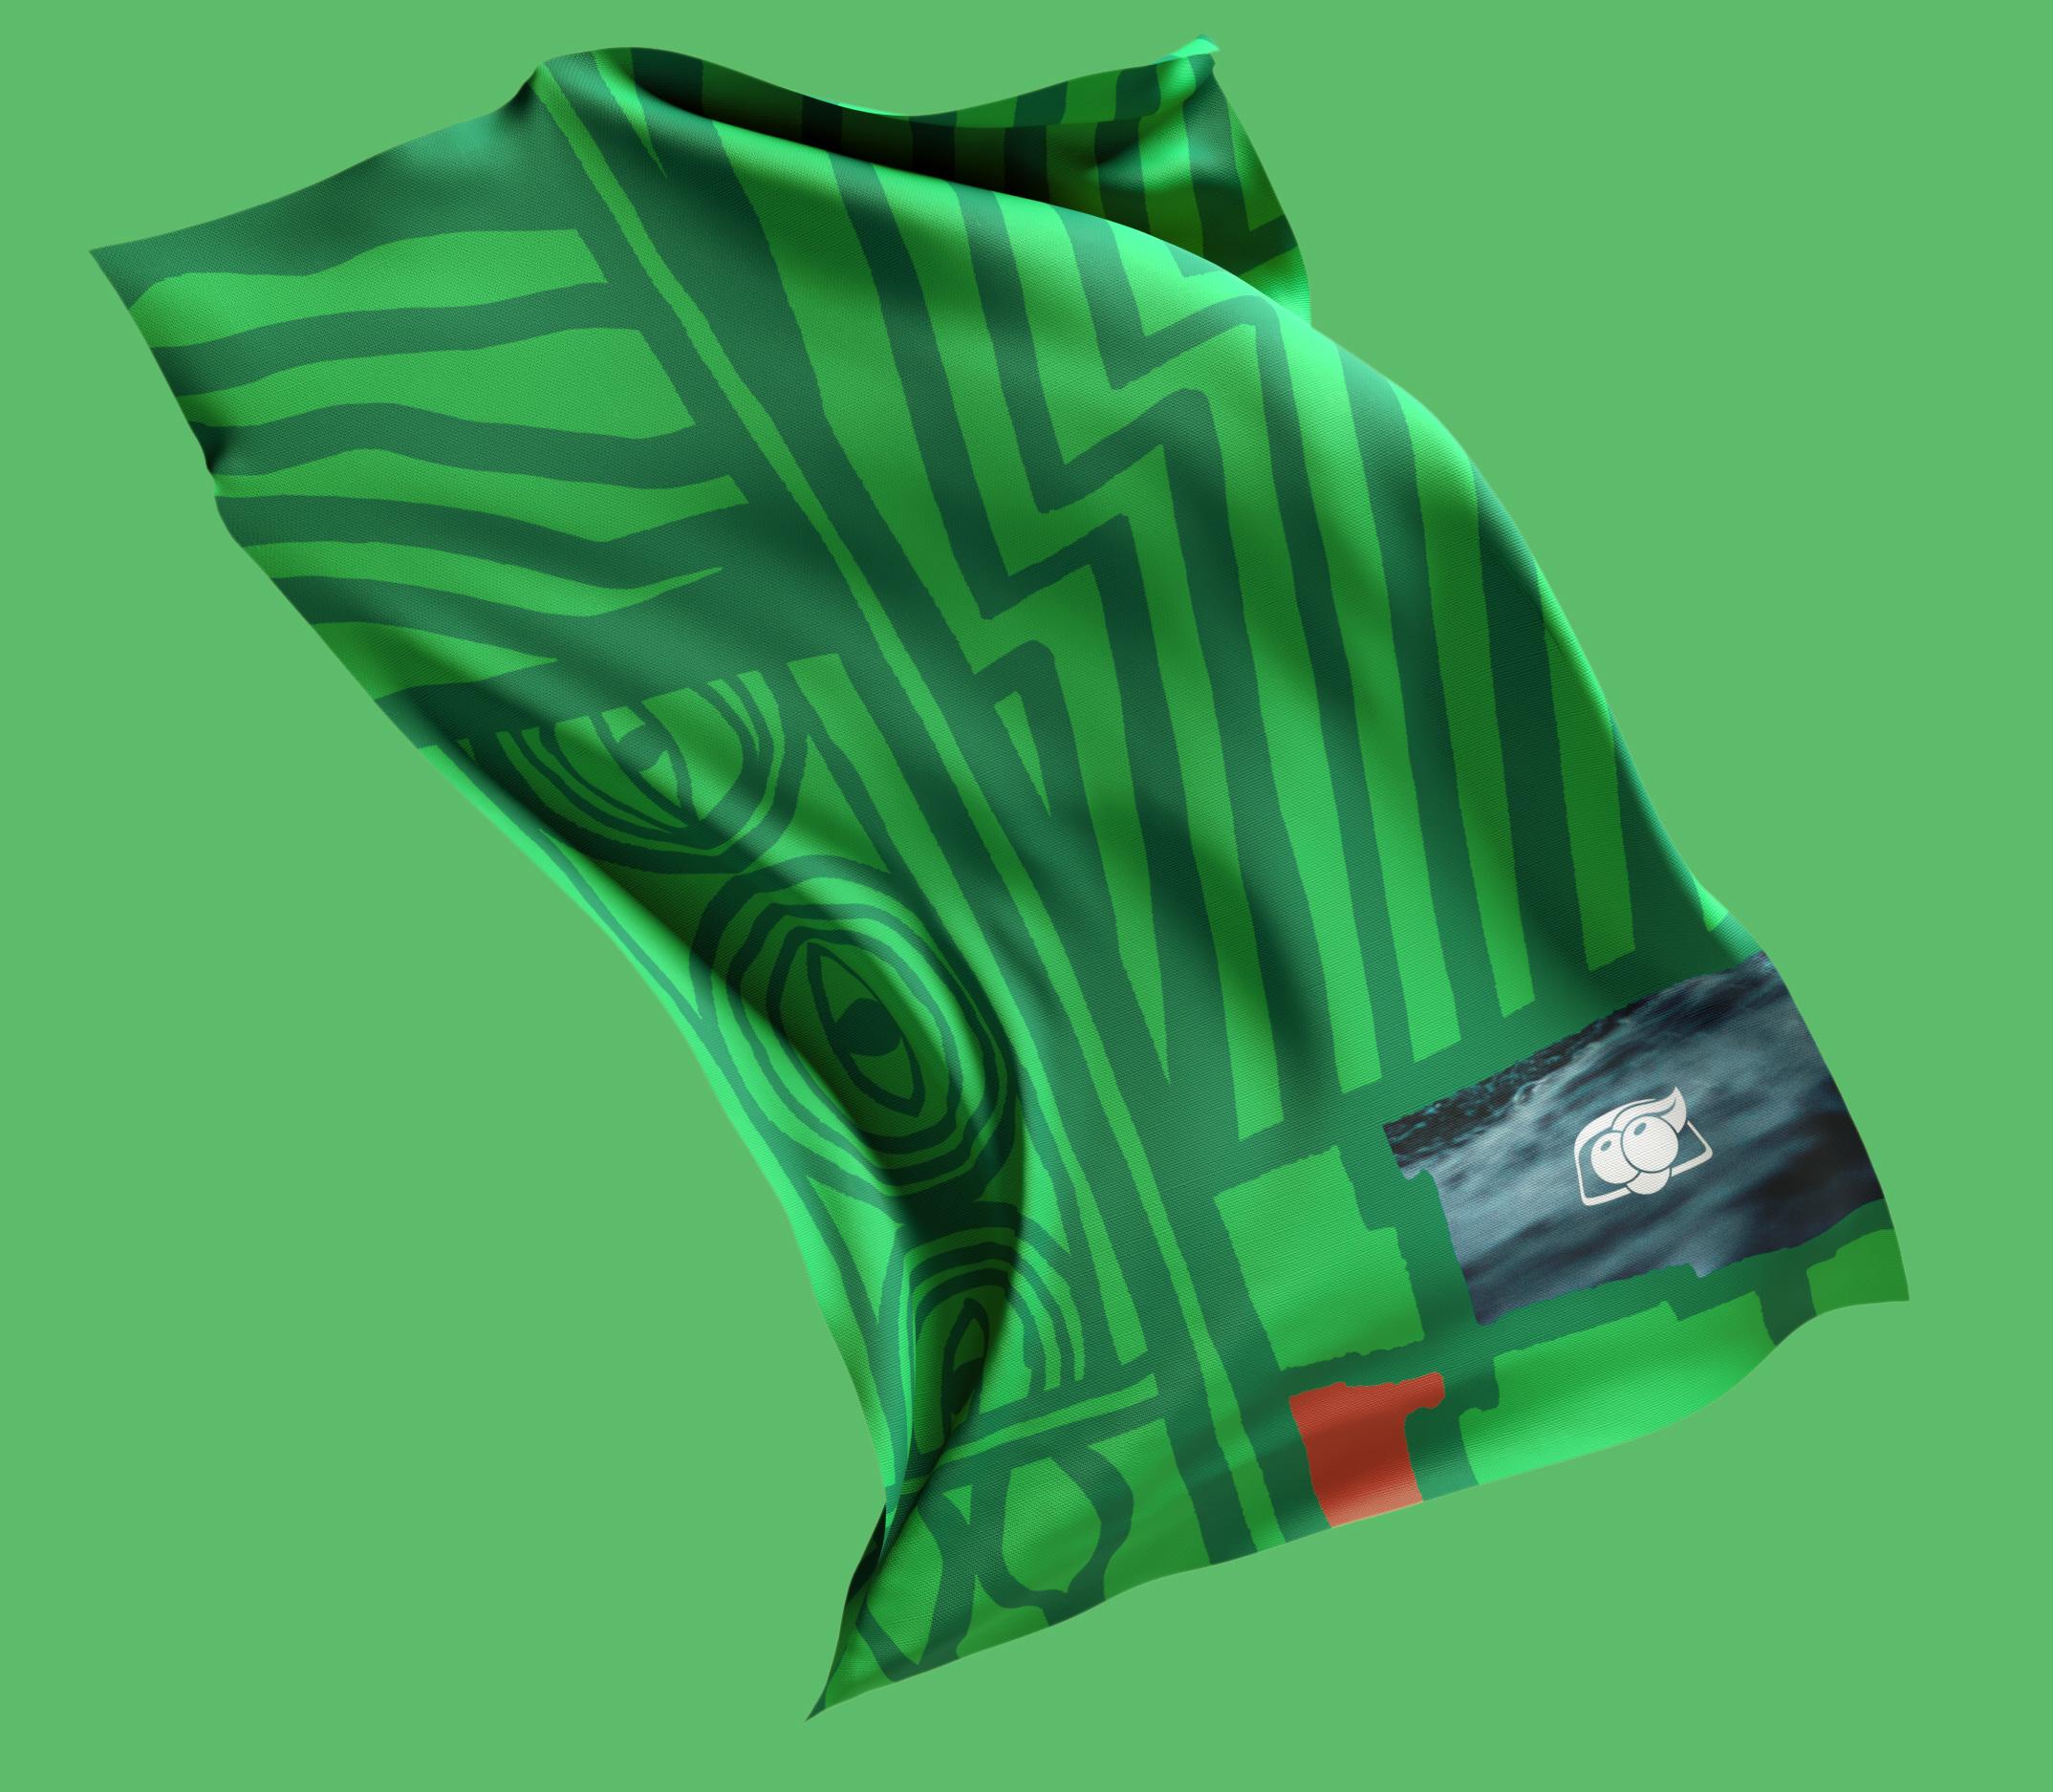 bandeira-guarana-leo-ex